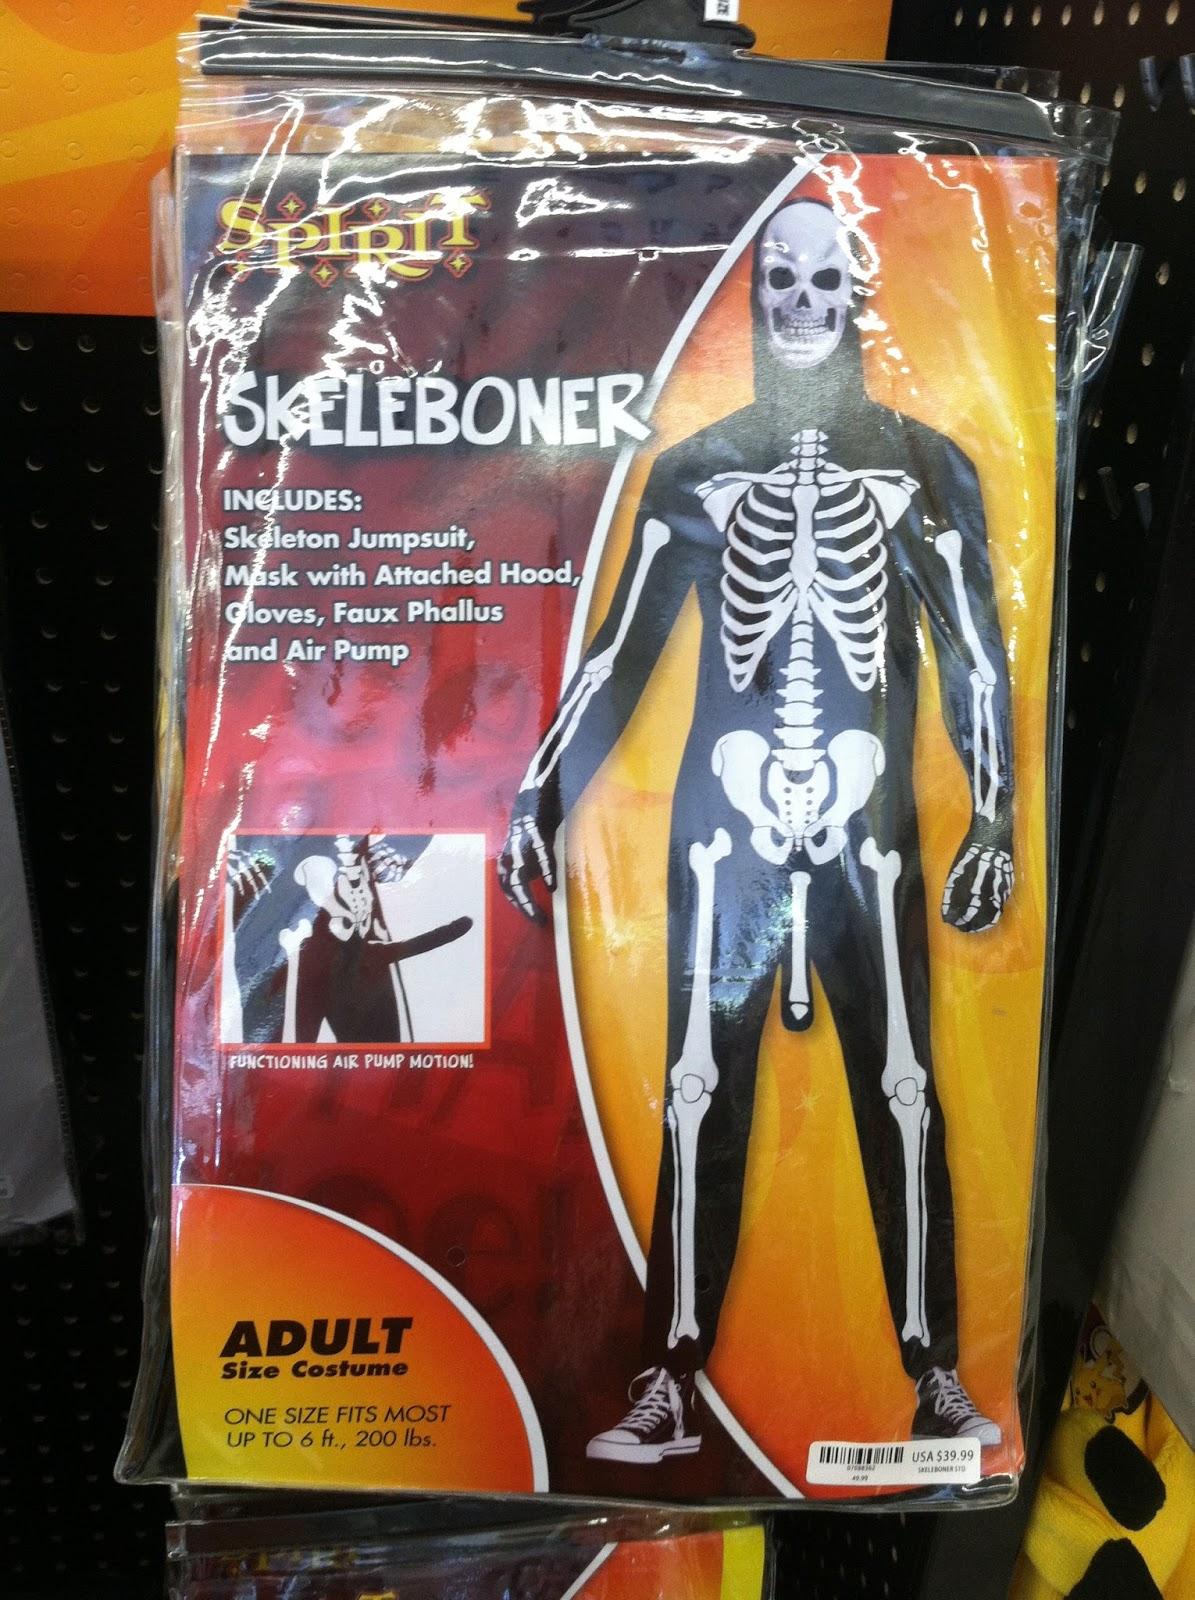 D.I. Treasures: 2017 Cringe Worthy Halloween Costume